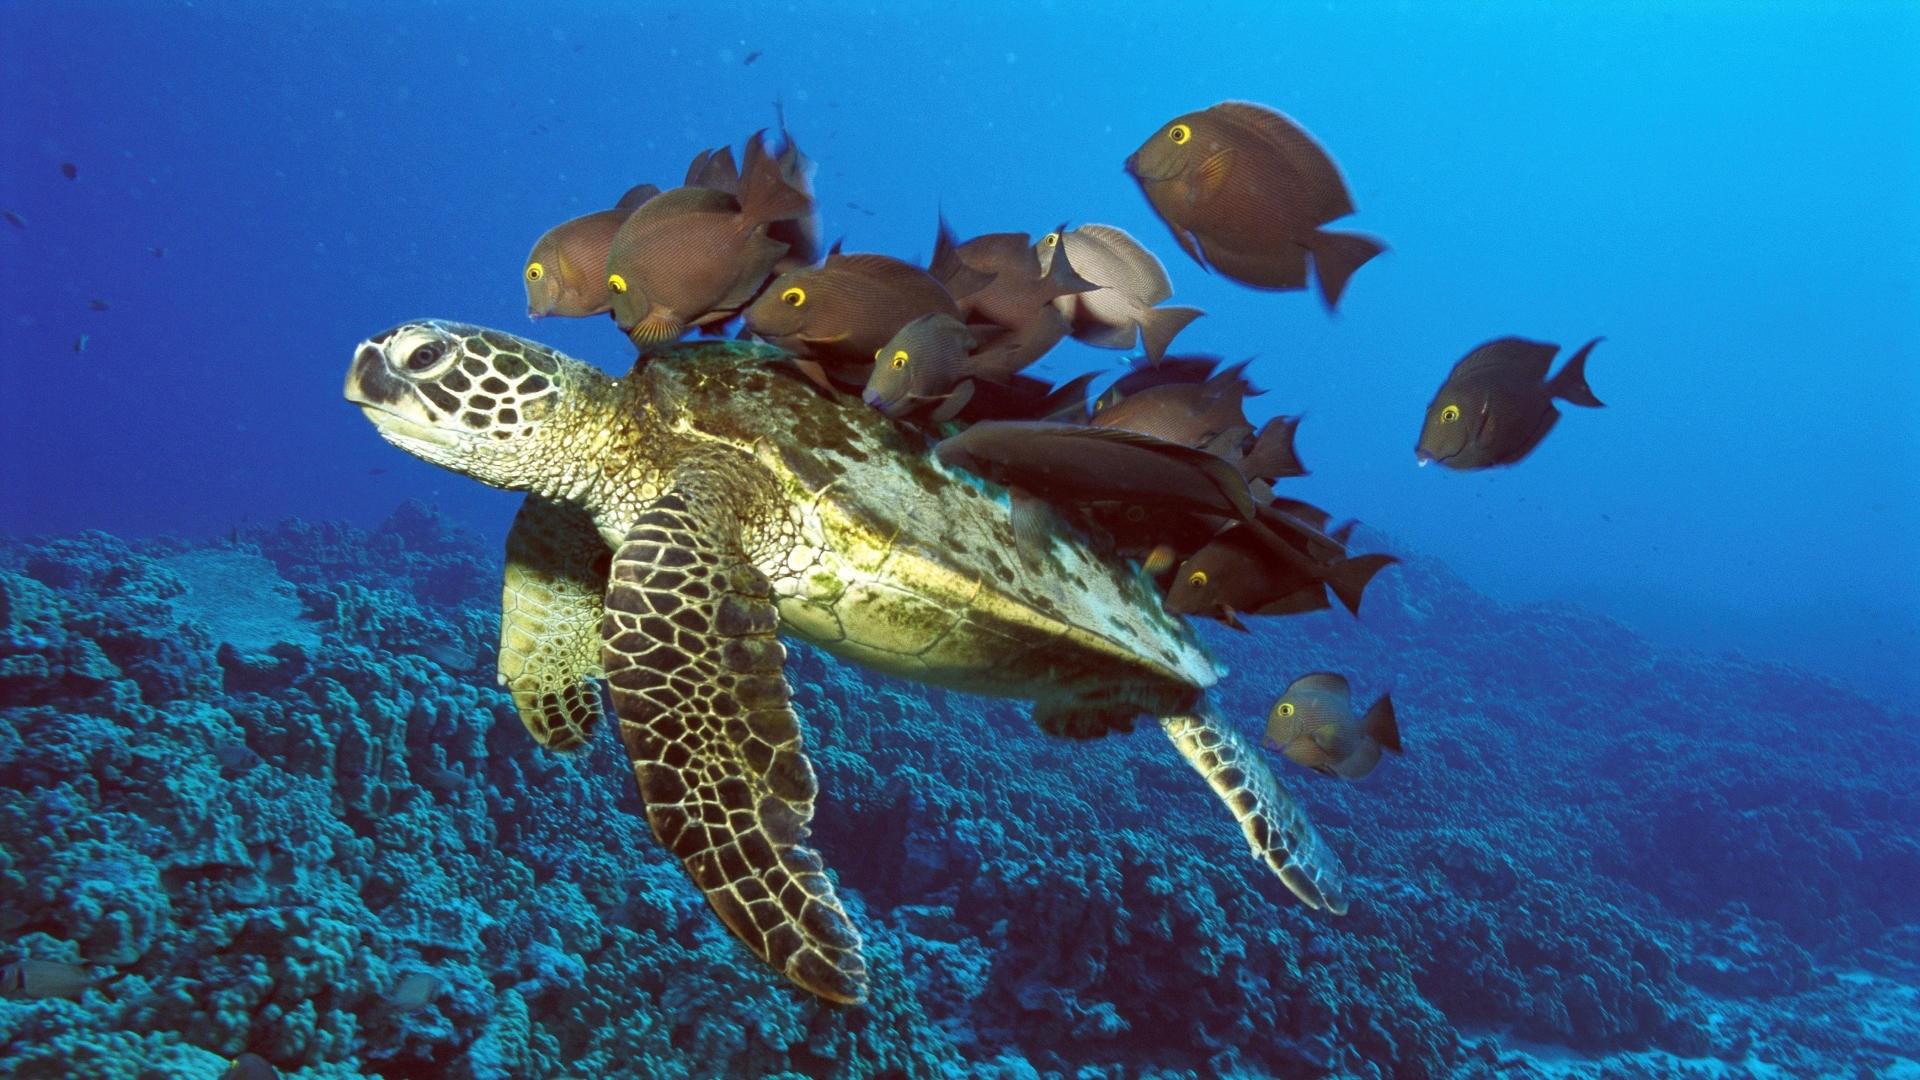 Animals Full HD Wallpapers – 1080p Wallpapers | Animal HD  Wallpapers 1080p, Widescreen Wallpapers · Sea TurtlesNinja TurtlesBaby …